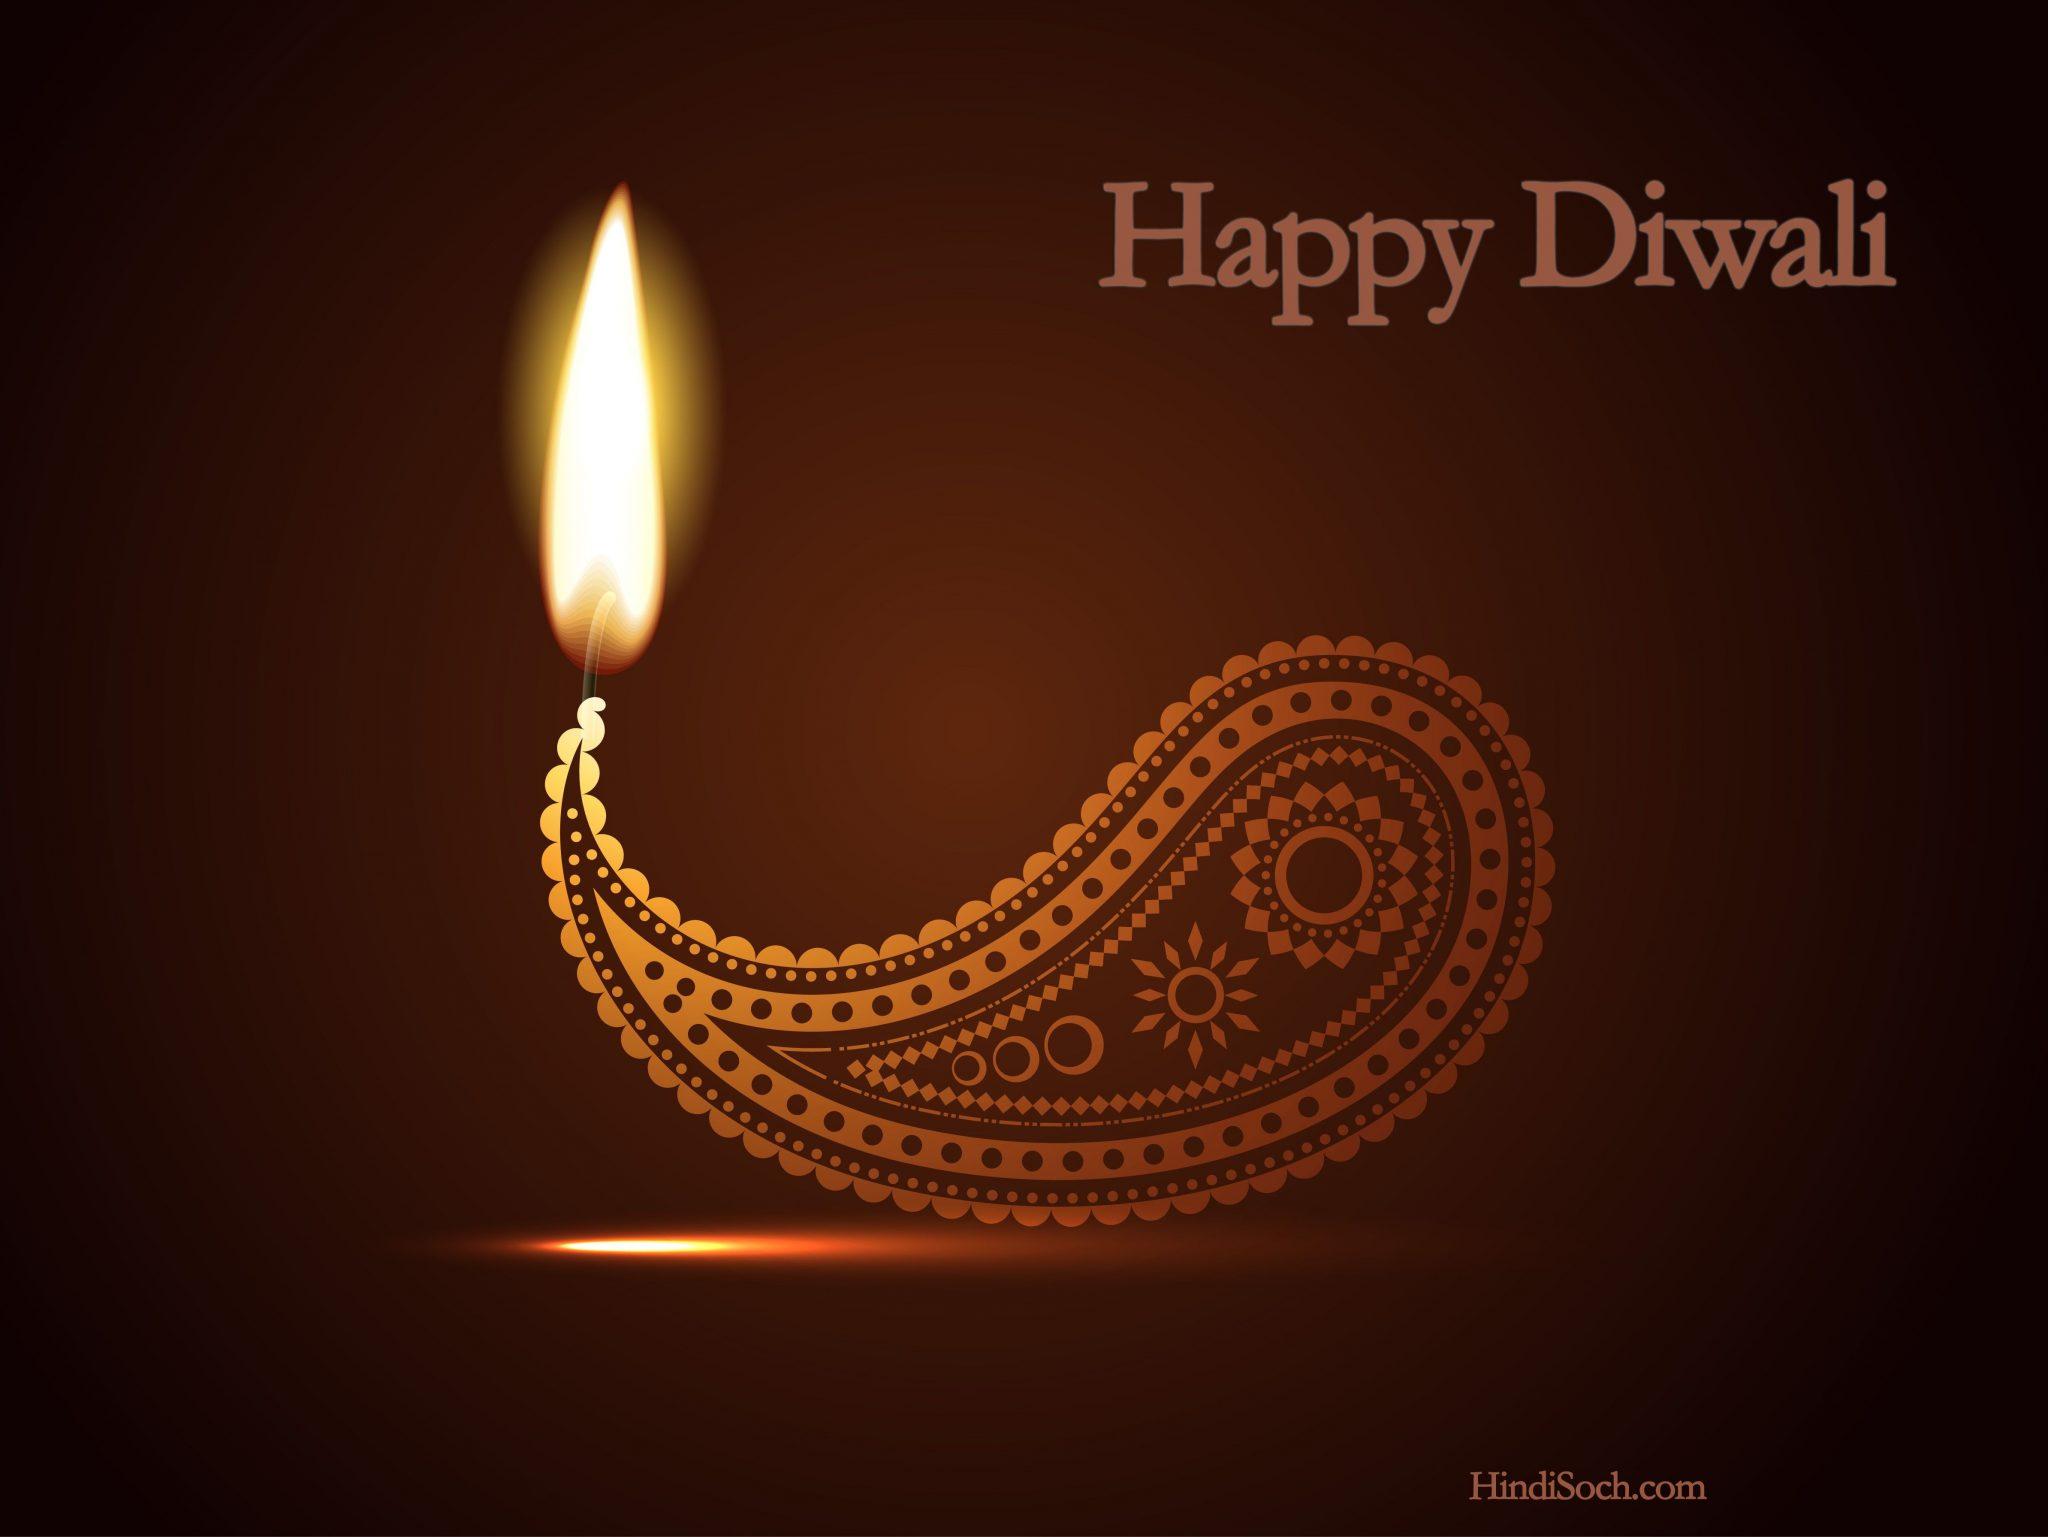 Shubh Diwali Images for Whatsapp